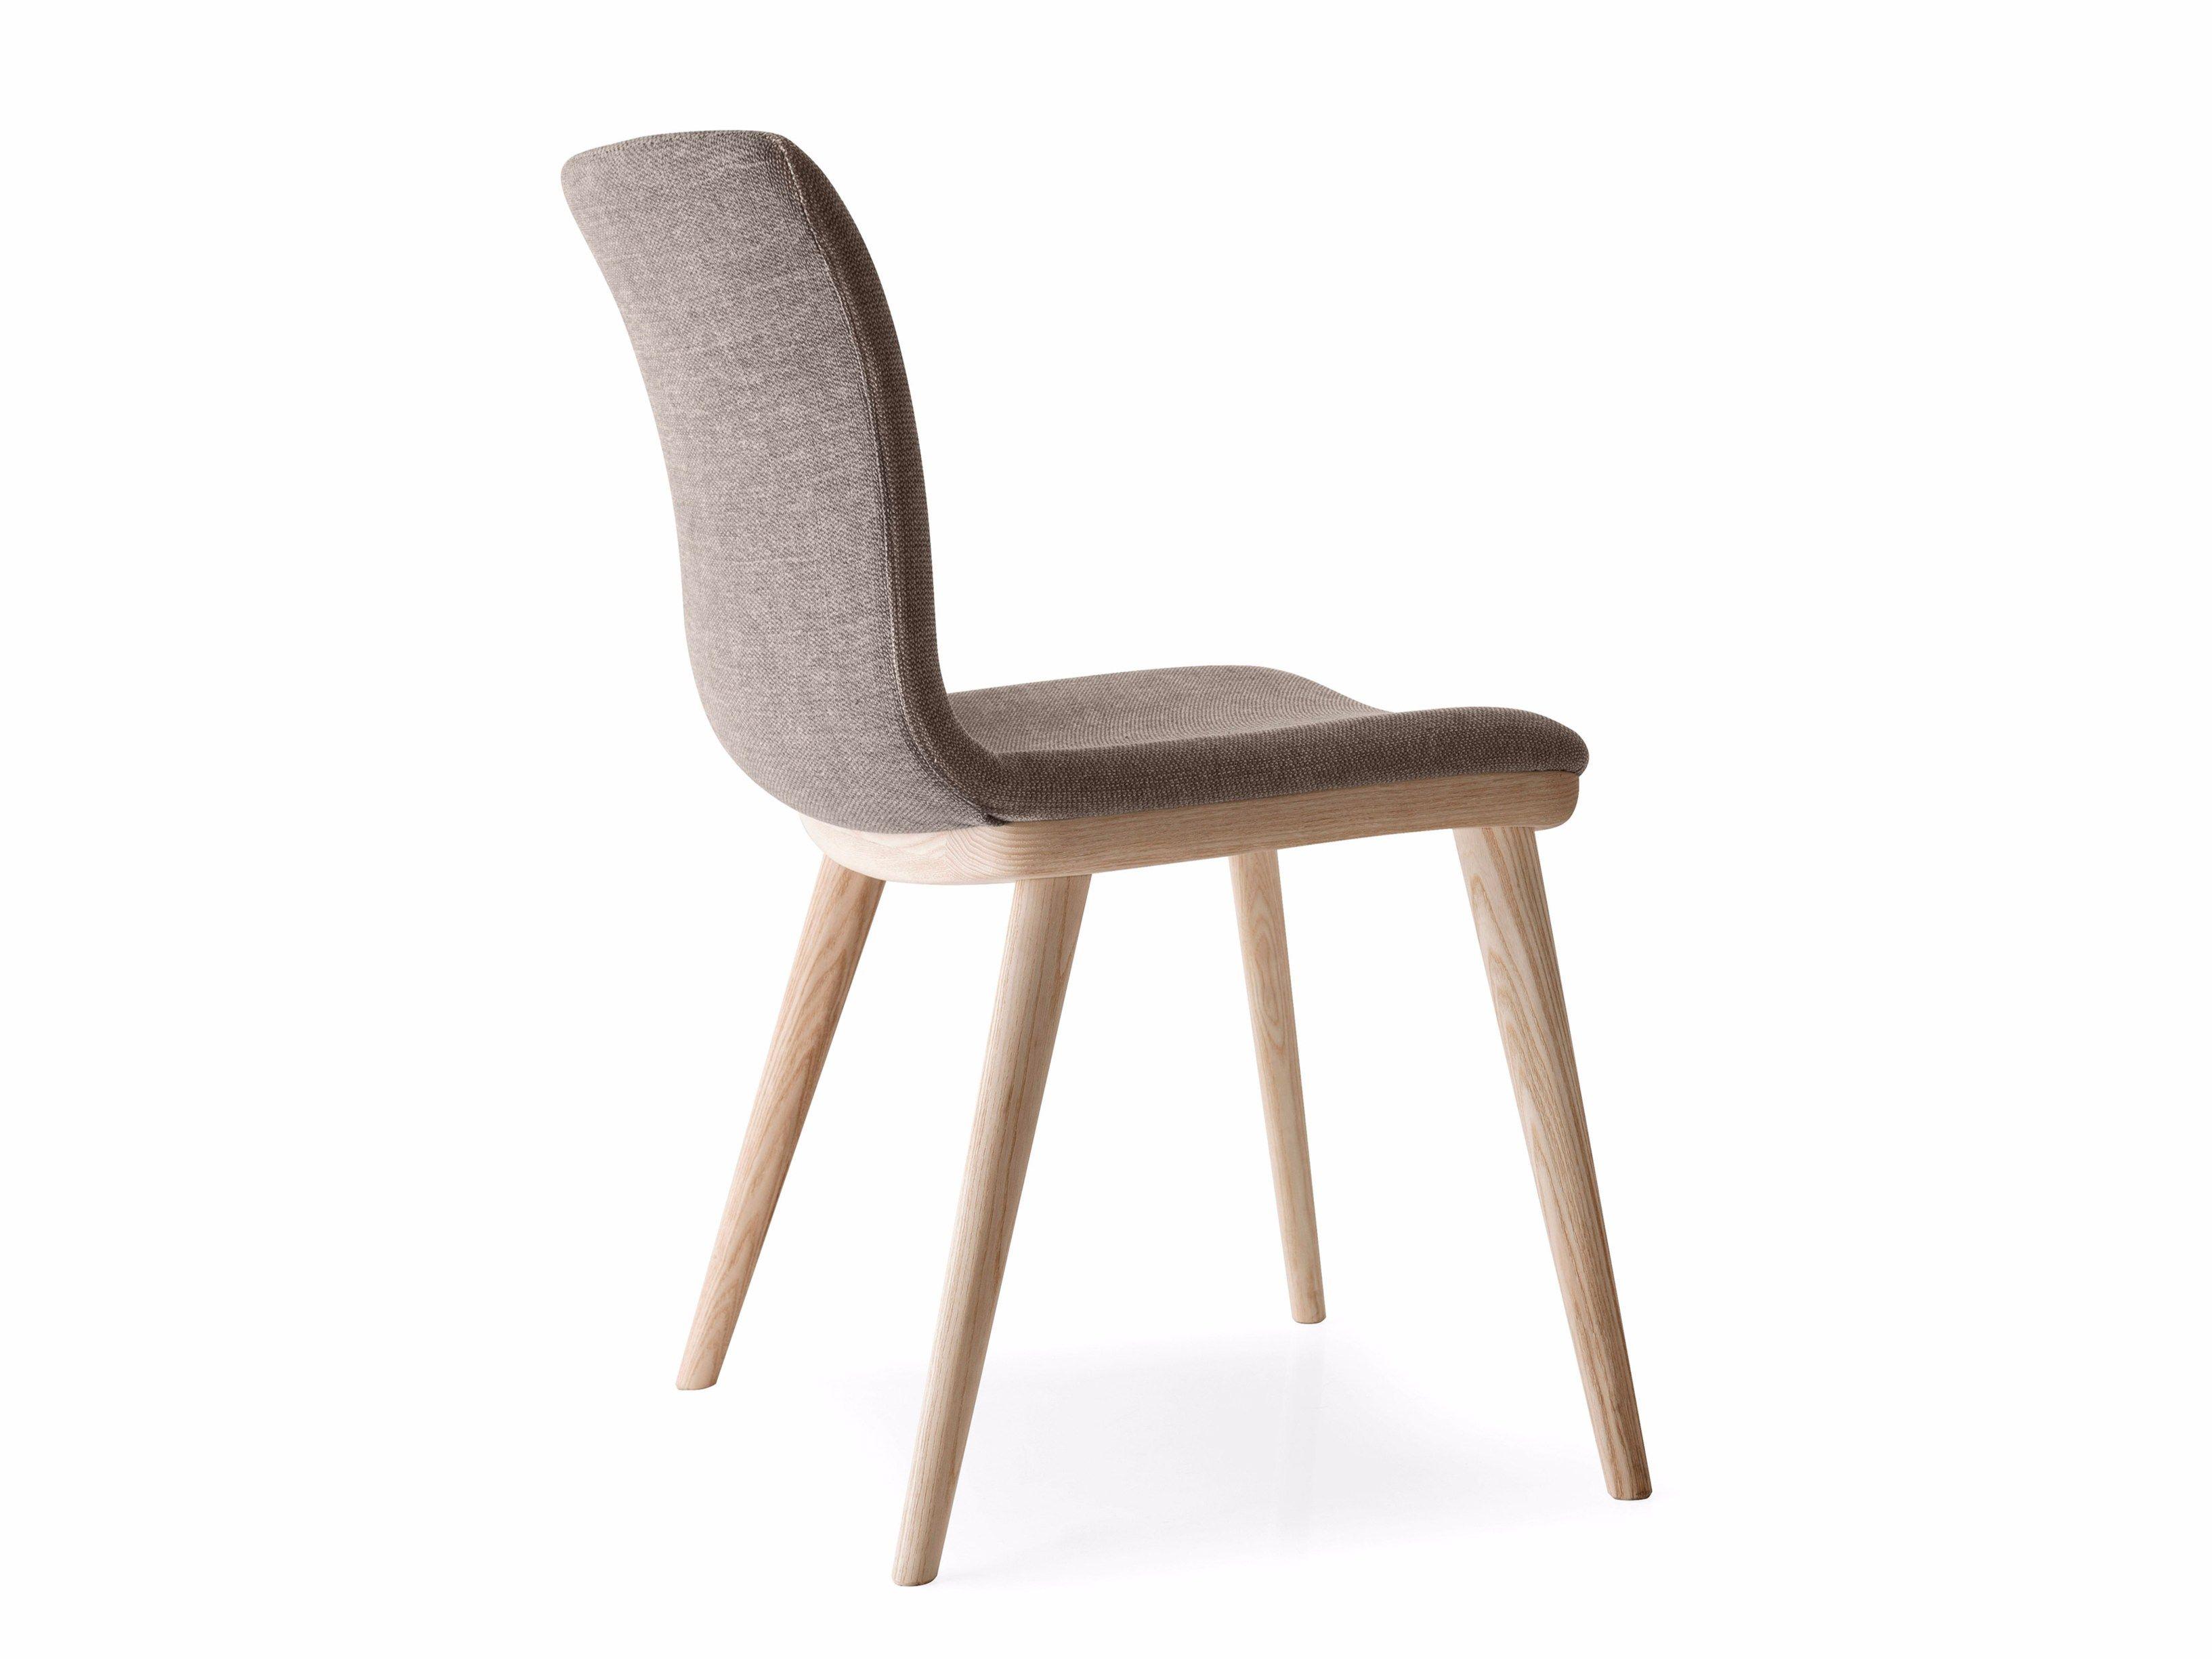 annie fabric chair by calligaris design edi e paolo ciani design. Black Bedroom Furniture Sets. Home Design Ideas